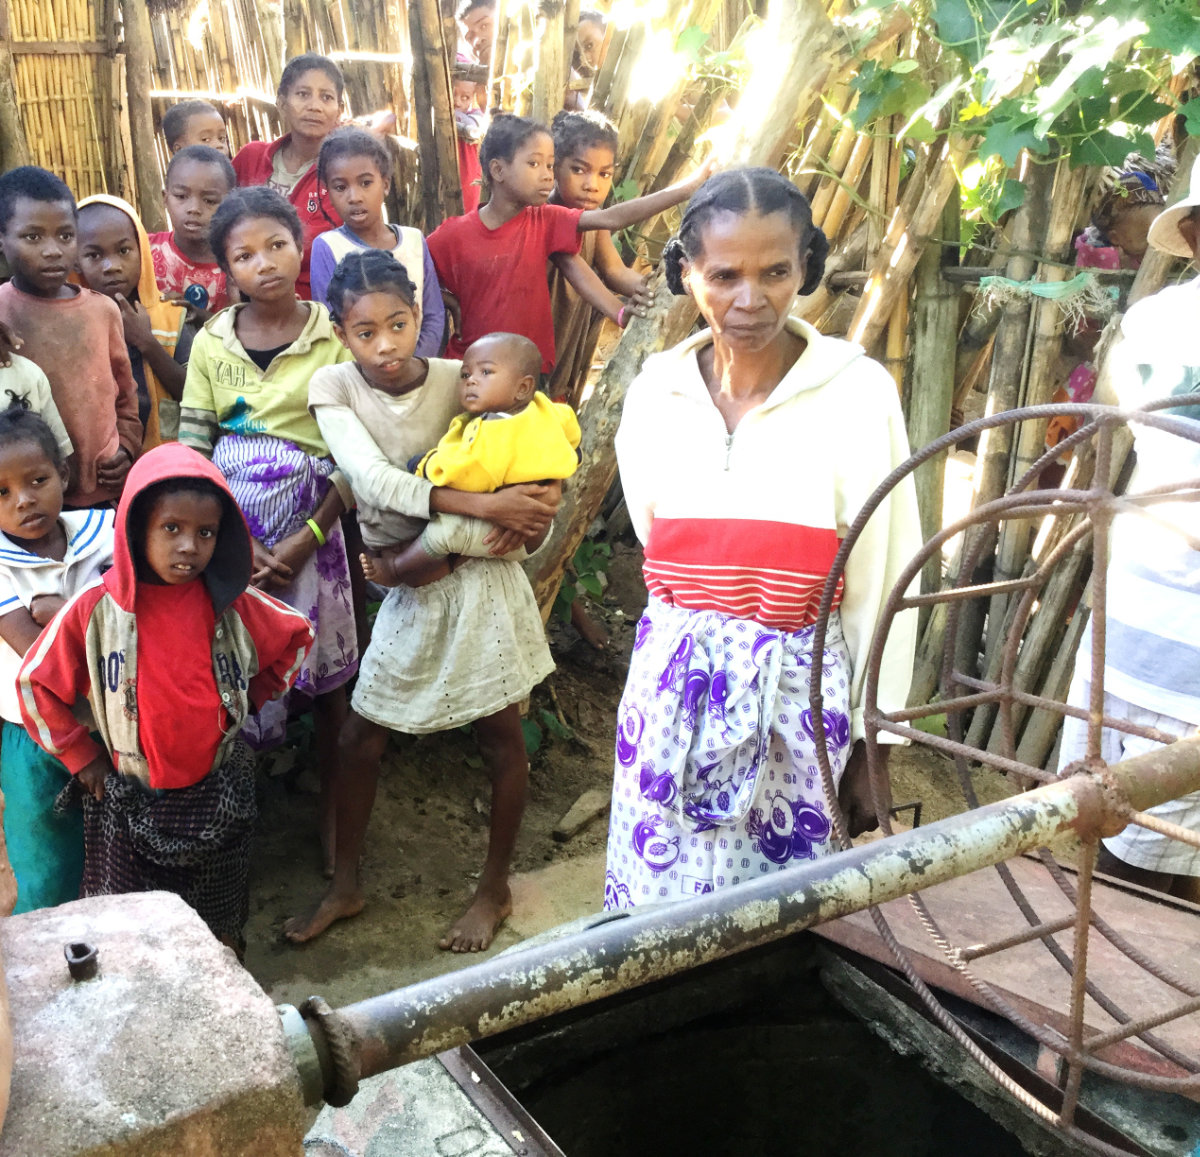 Puits de Manakana commune de Mananjari